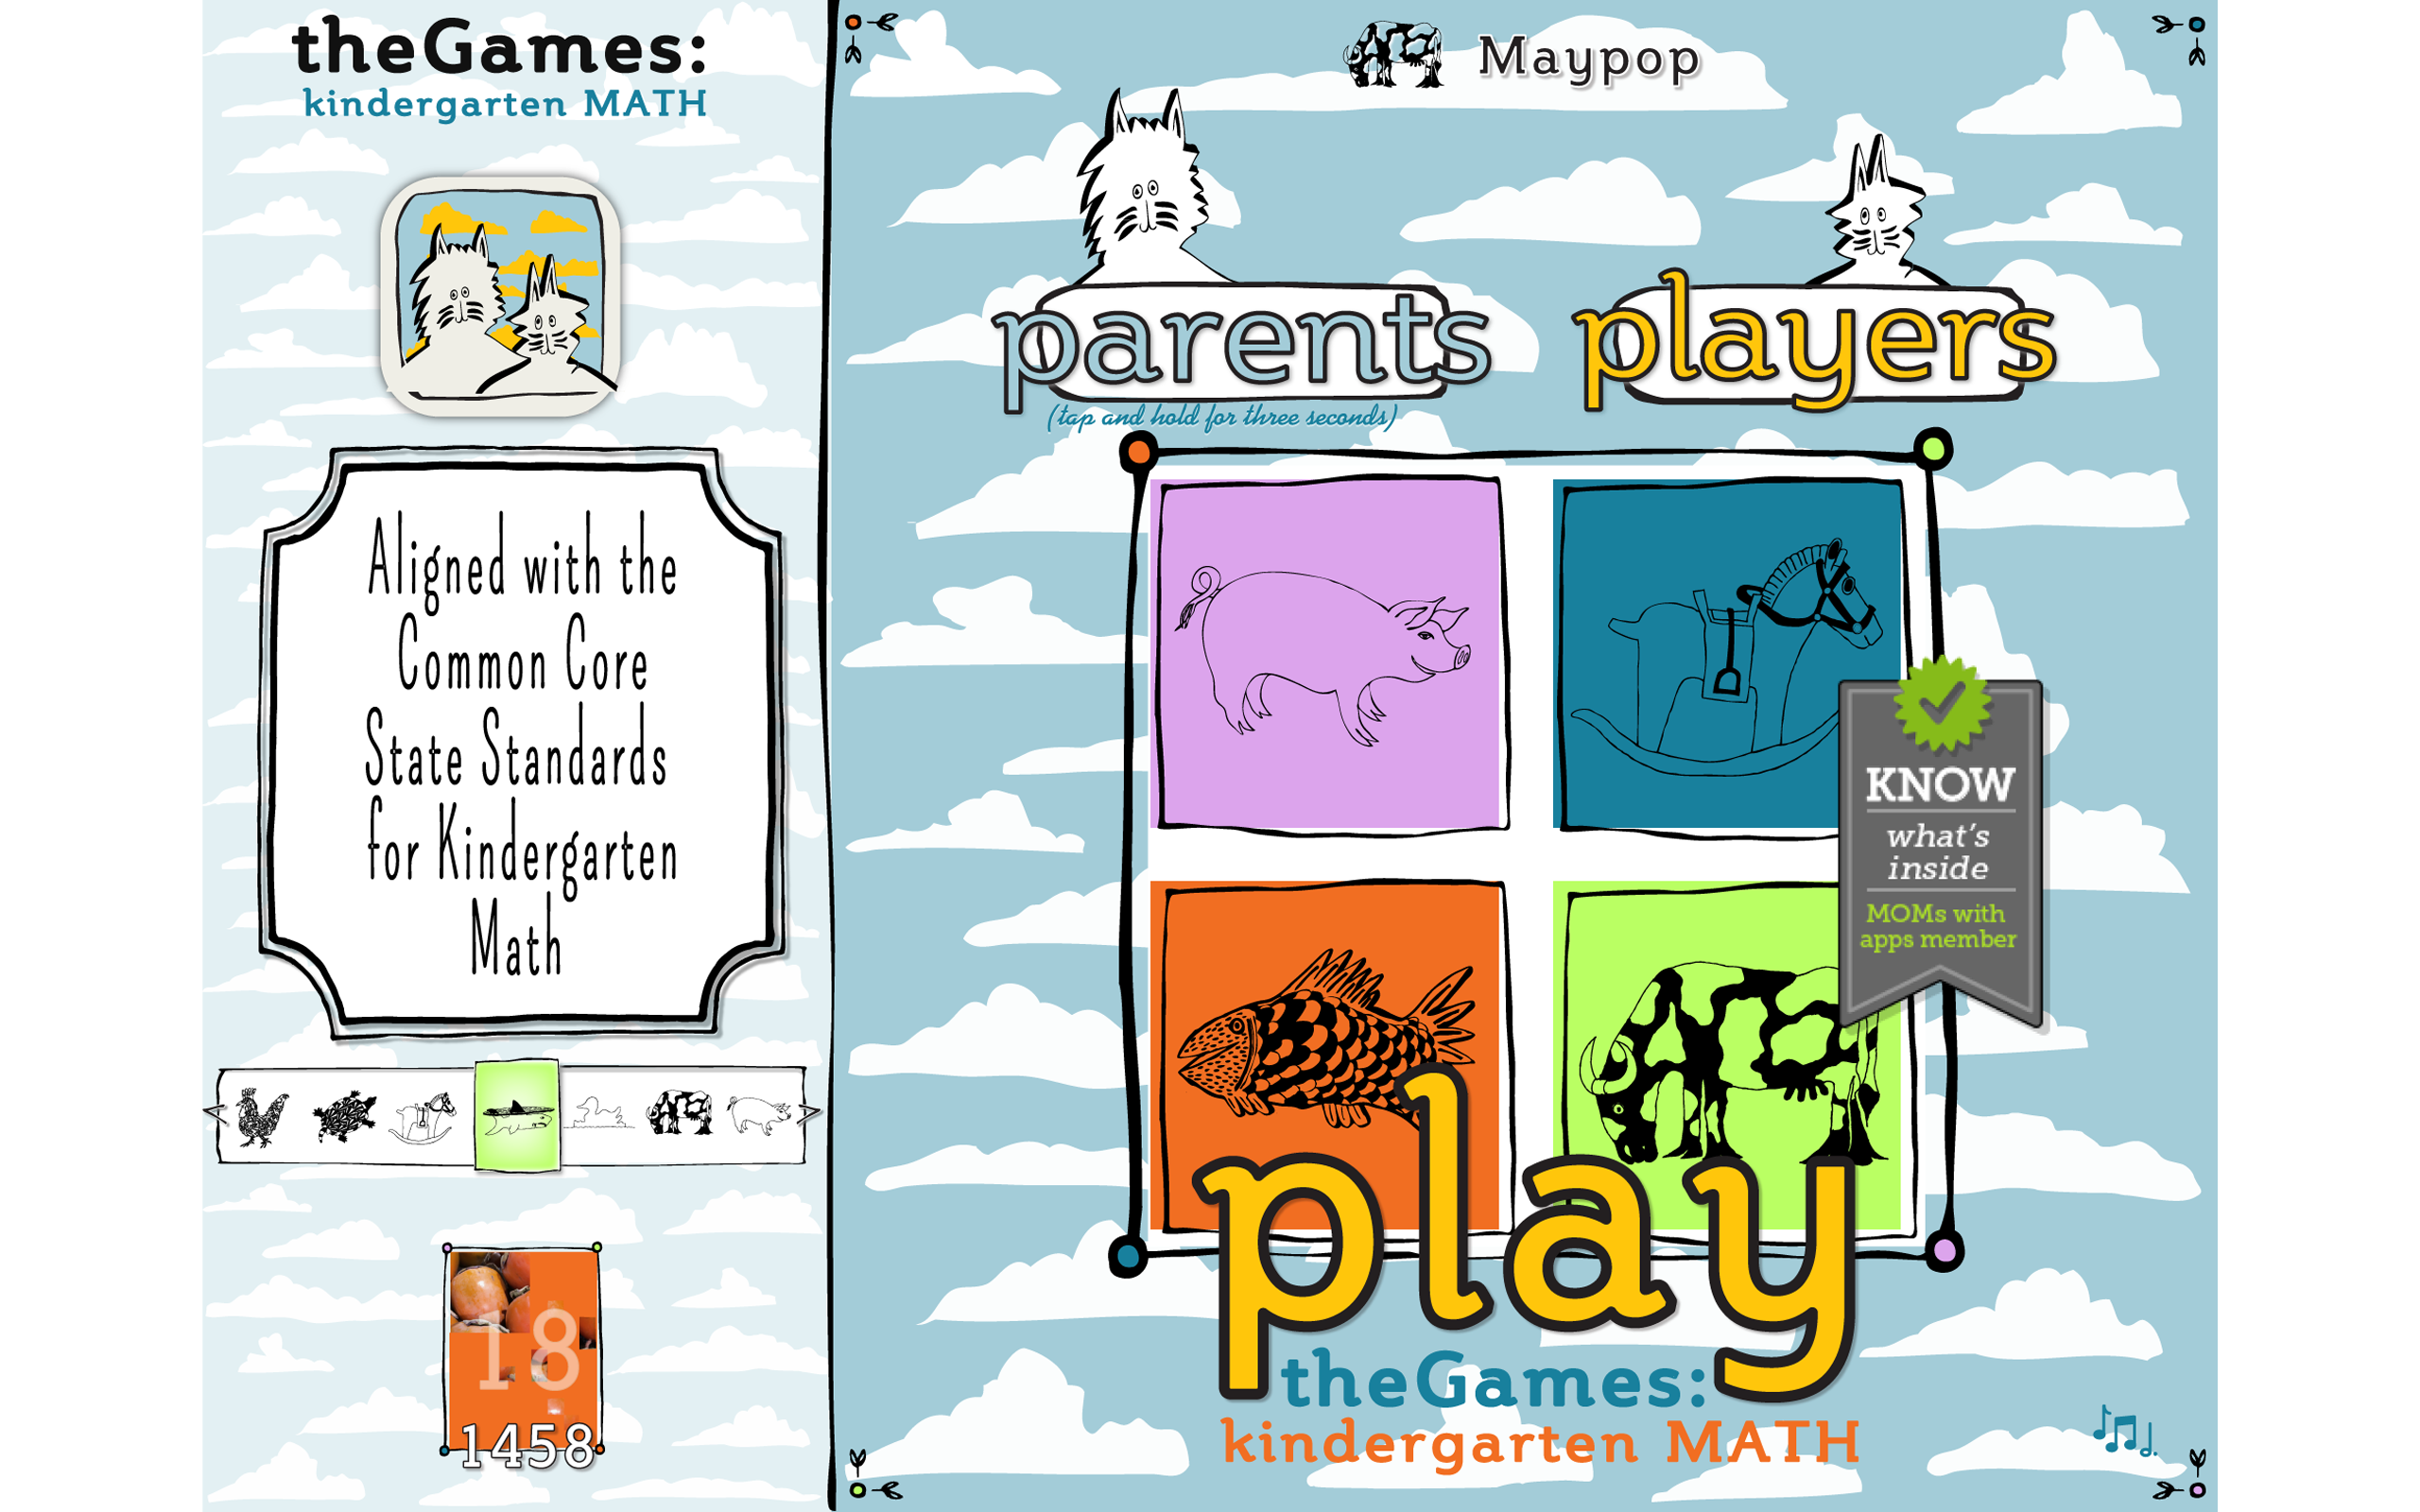 Amazon.com: theGames: Kindergarten Math (OLD VERSION): Appstore for ...